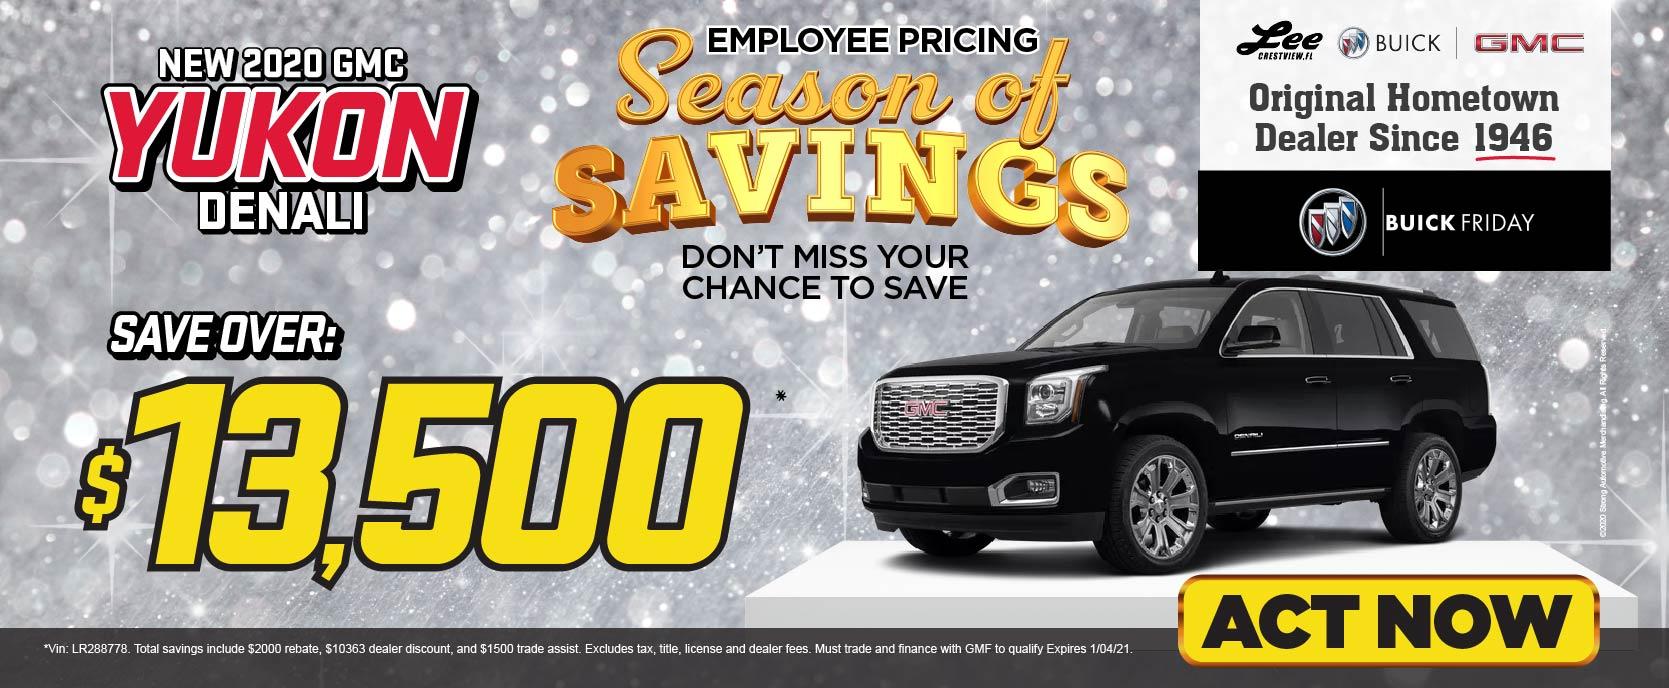 New 2020 GMC Yukon - Save over $13,500